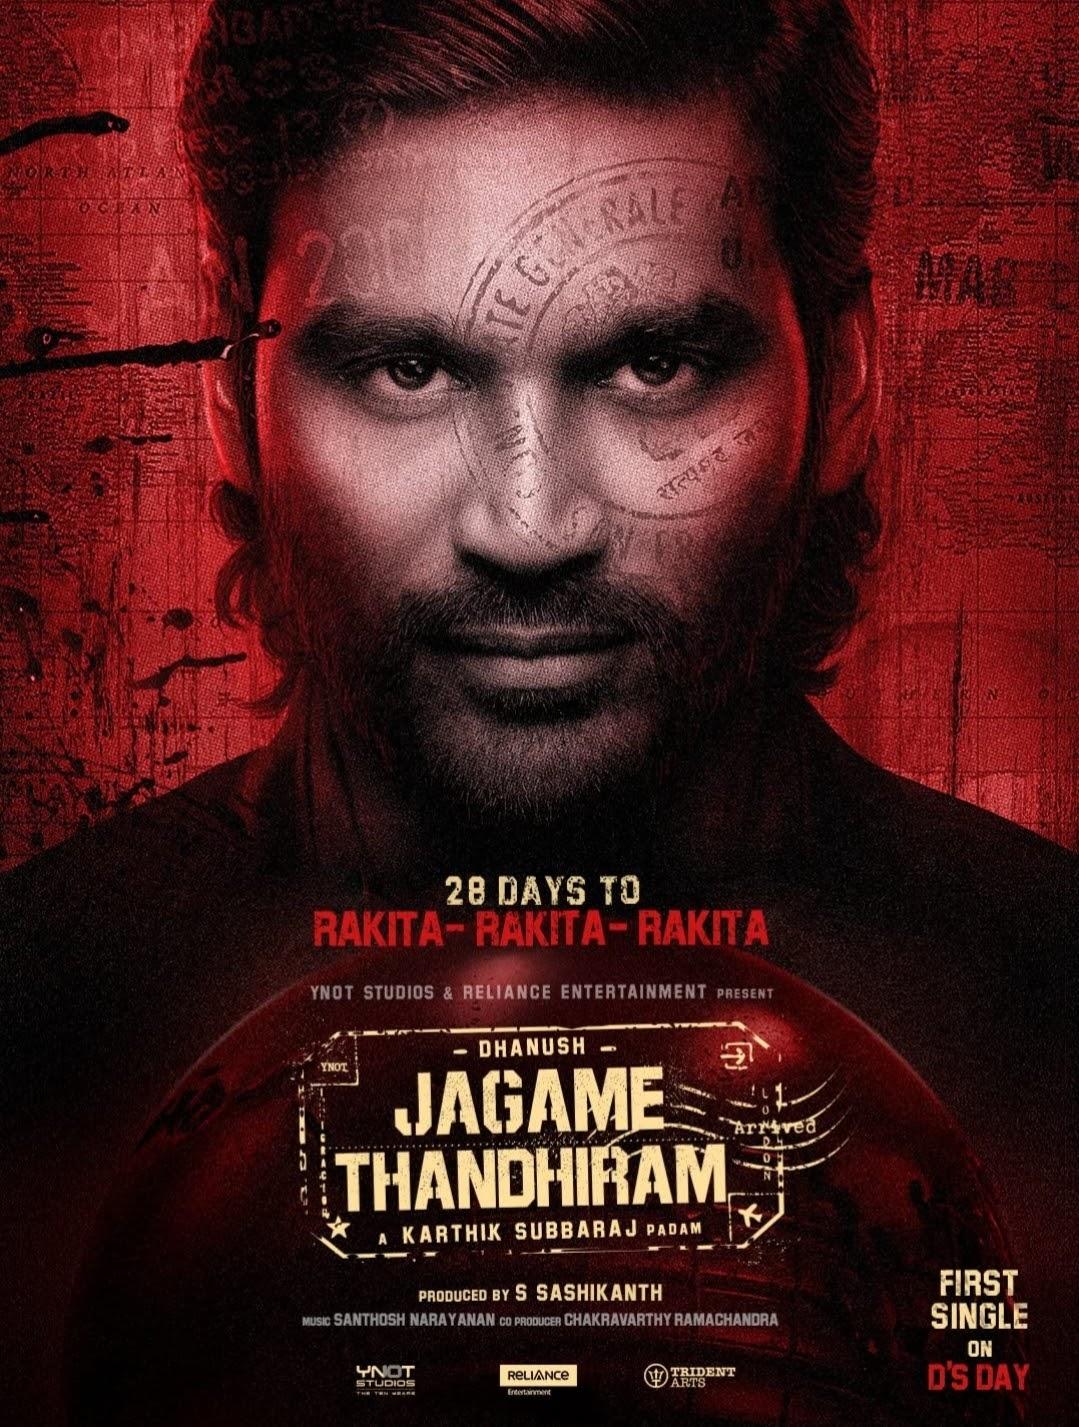 Jagame Thanthiram Full Movie Leaked